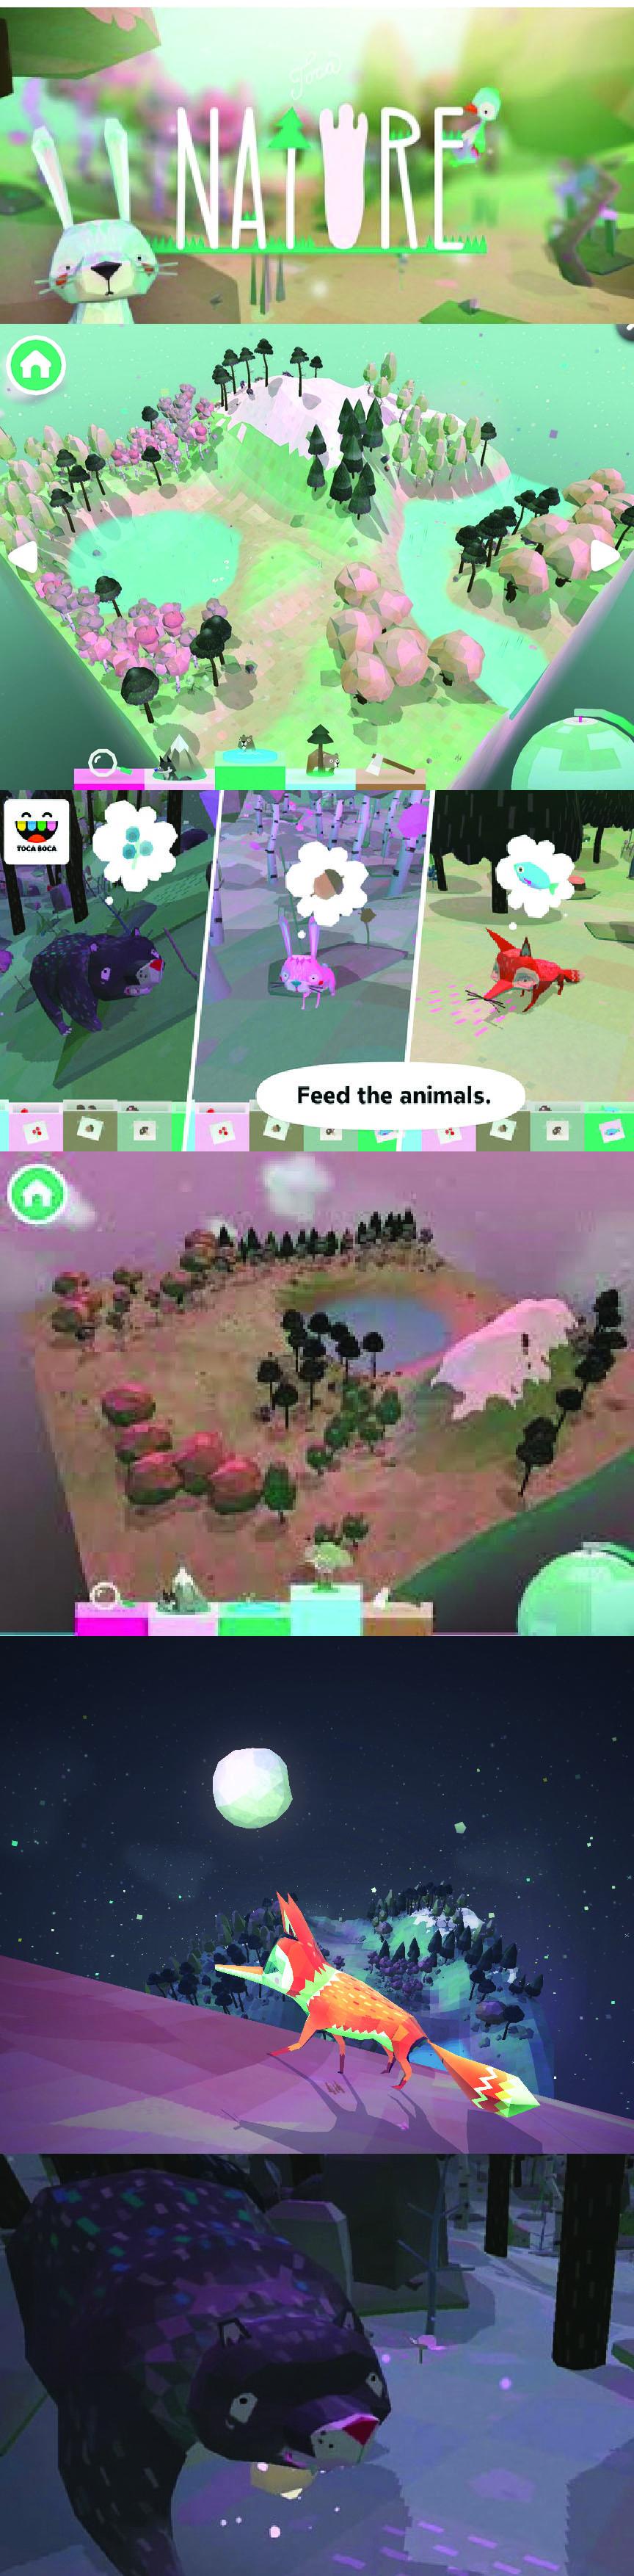 toca nature beautiful wildlife sandbox game app (With